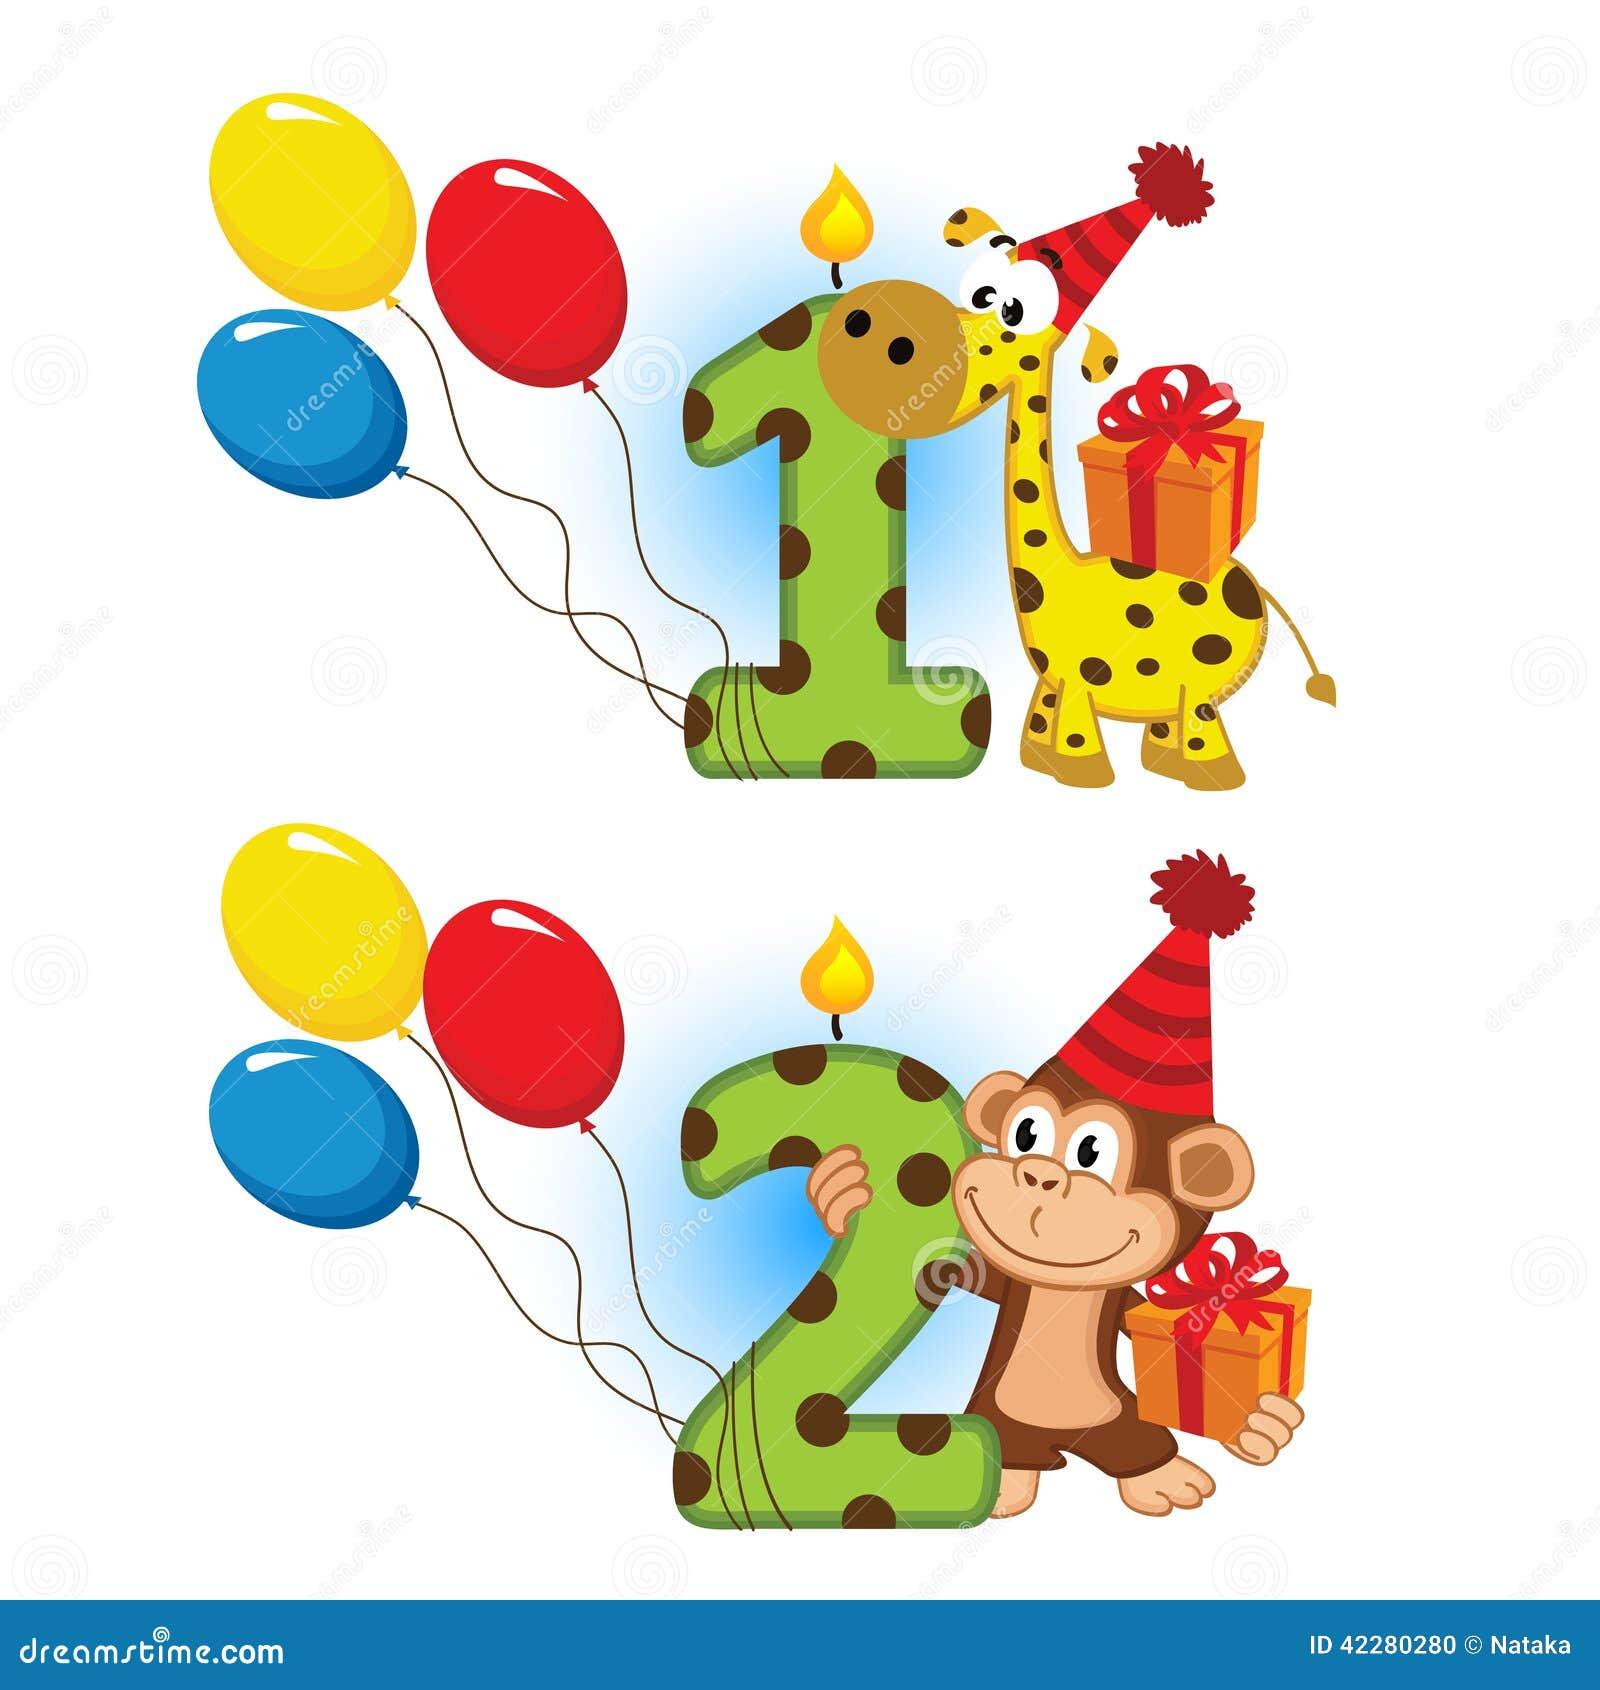 Tweede Verjaardag.Eerst Tweede Verjaardag Met Dier Stock Illustratie